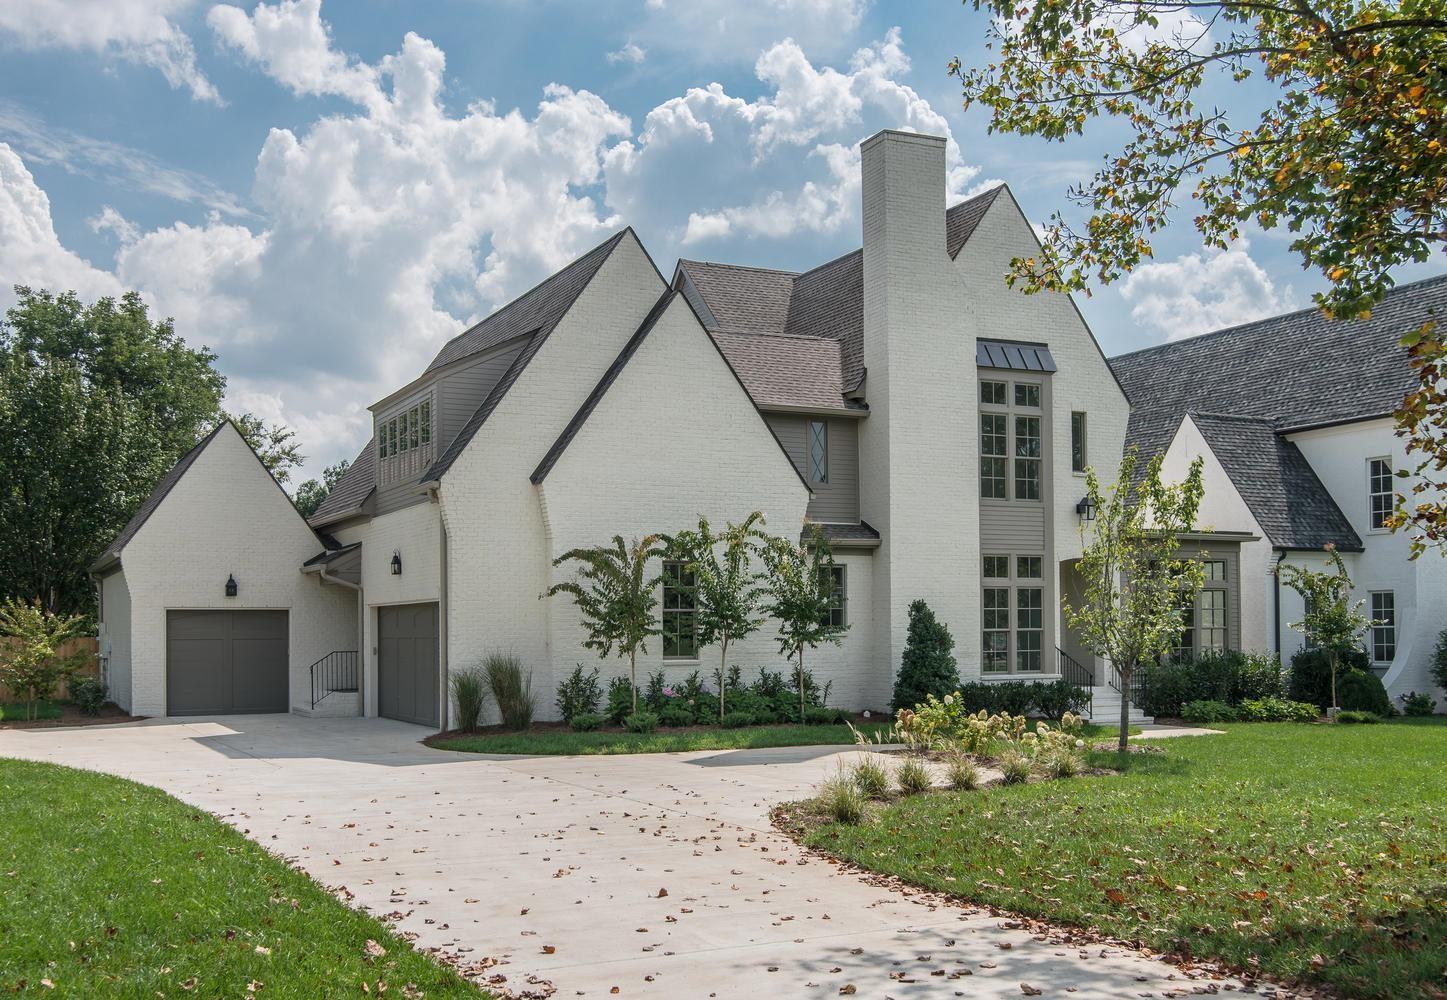 1809 Graybar Ln, Nashville, TN 37215 - Nashville, TN real estate listing